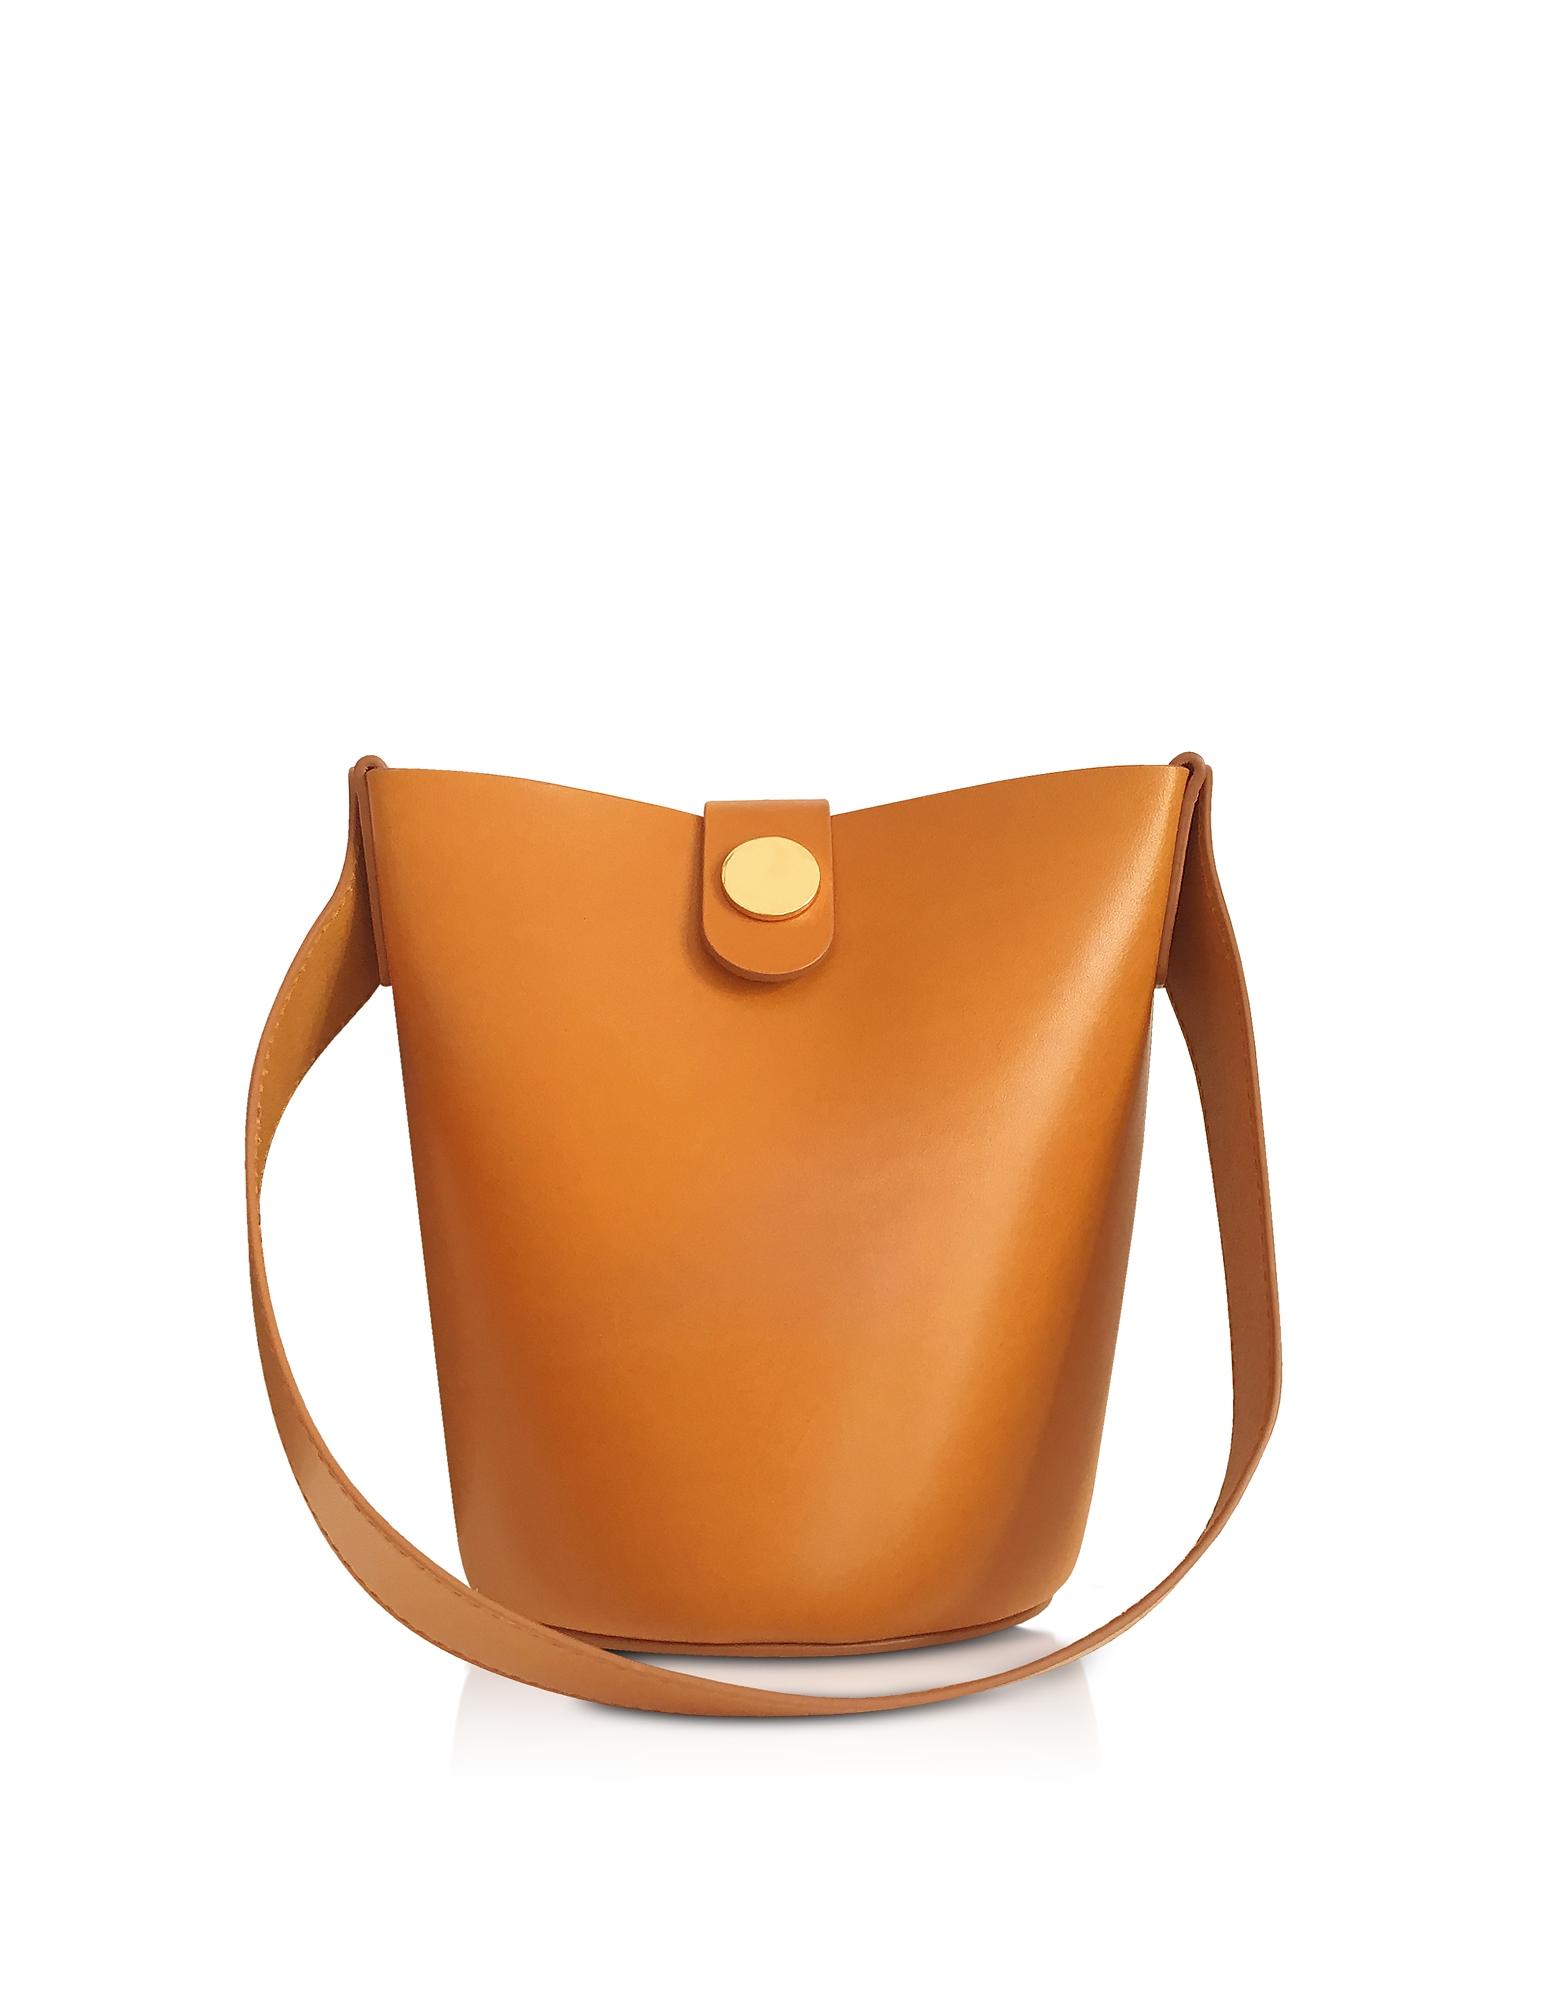 Sophie Hulme Handbags, Shiny Saddle Leather Nano Swing Bag